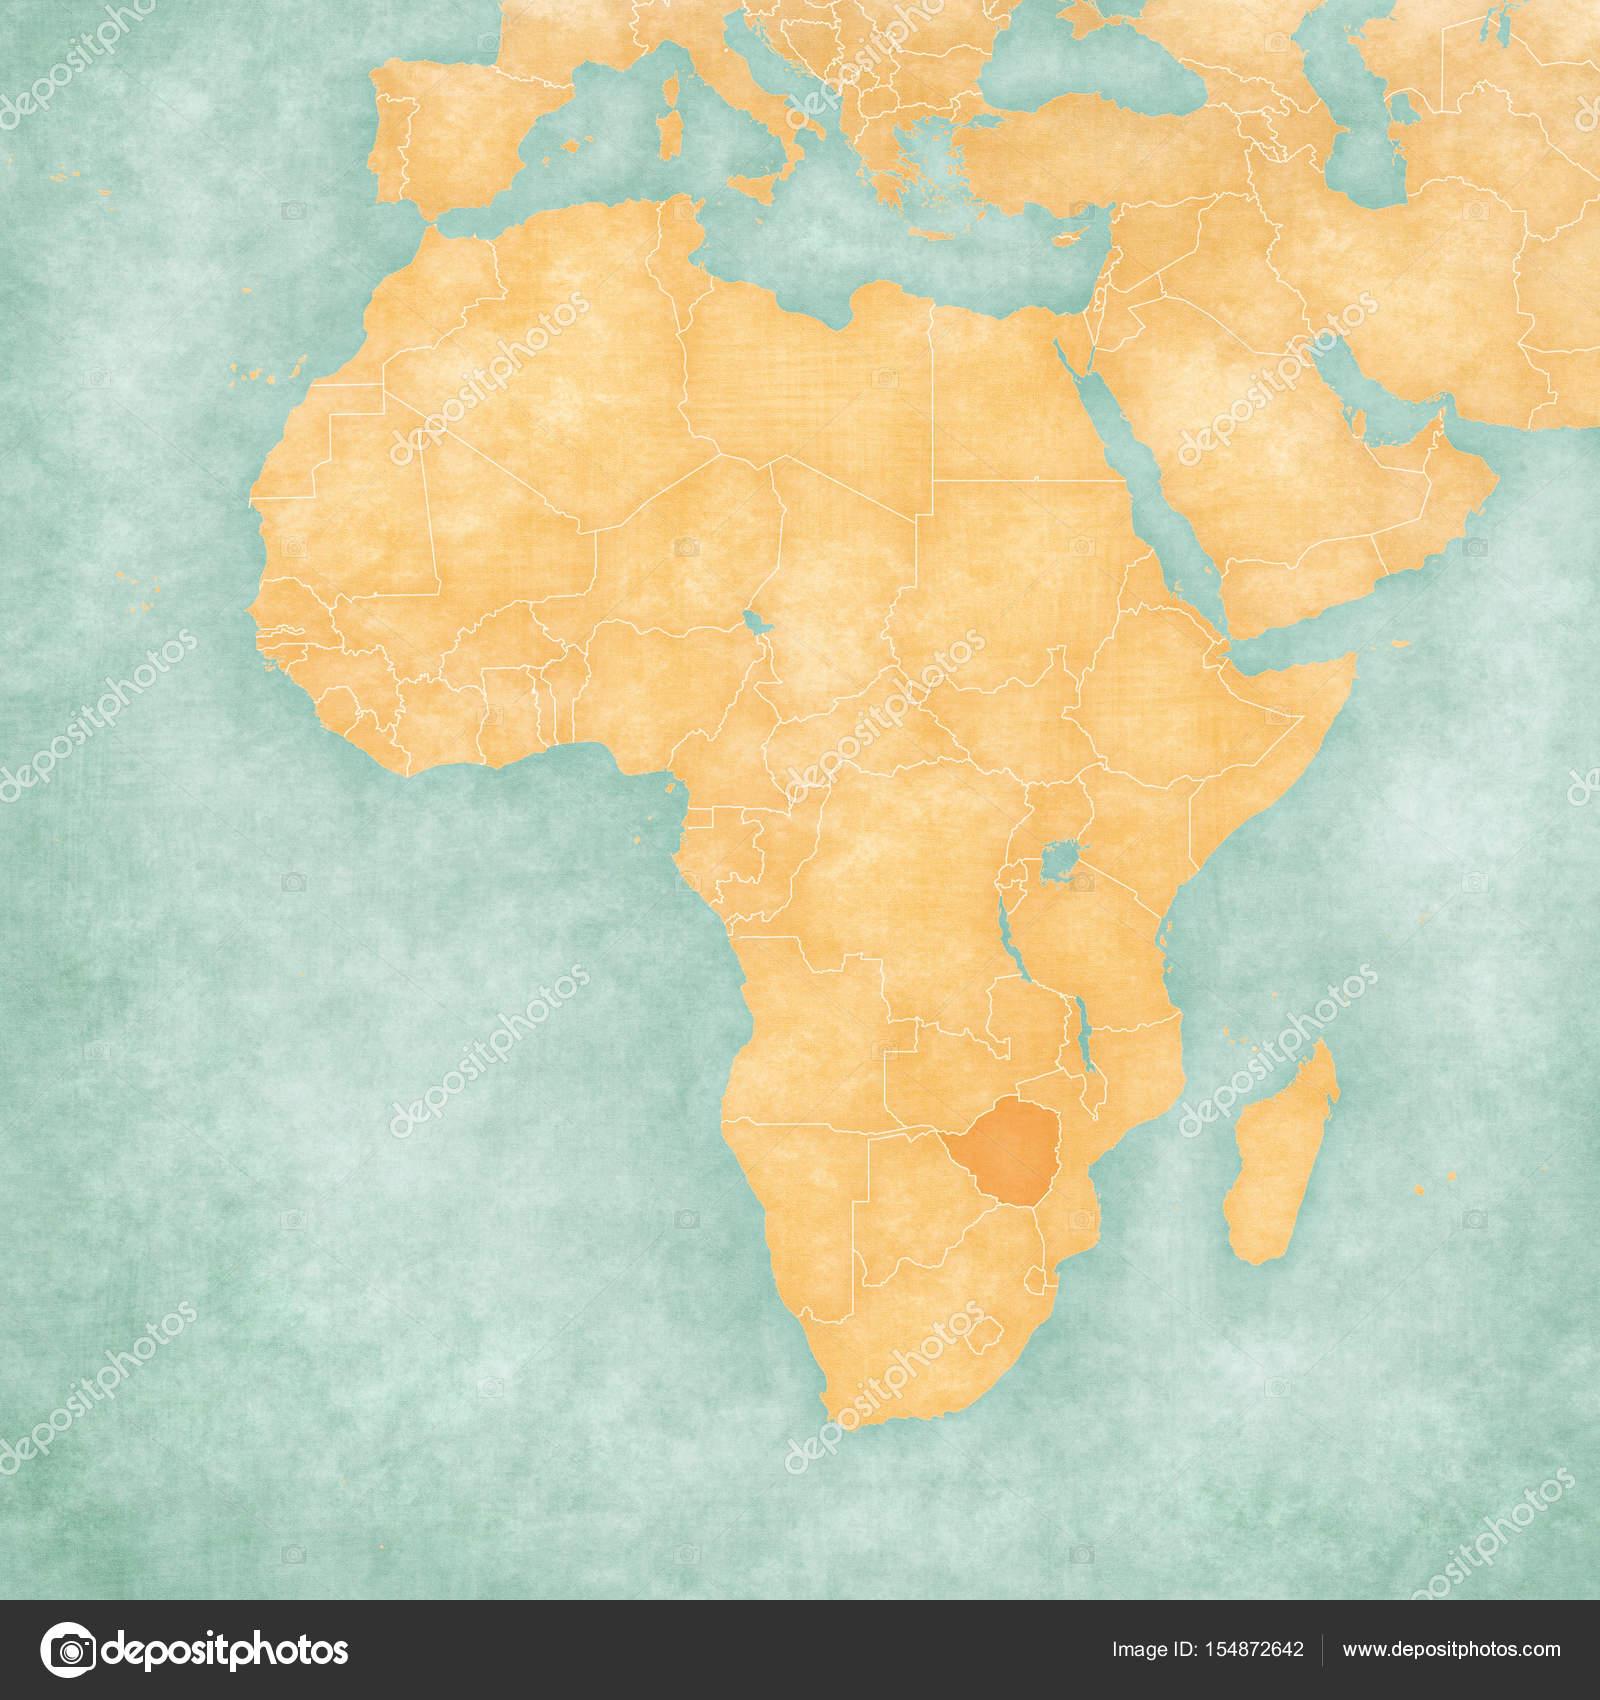 Map Of Africa Zimbabwe.Map Of Africa Zimbabwe Stock Photo C Tindo 154872642